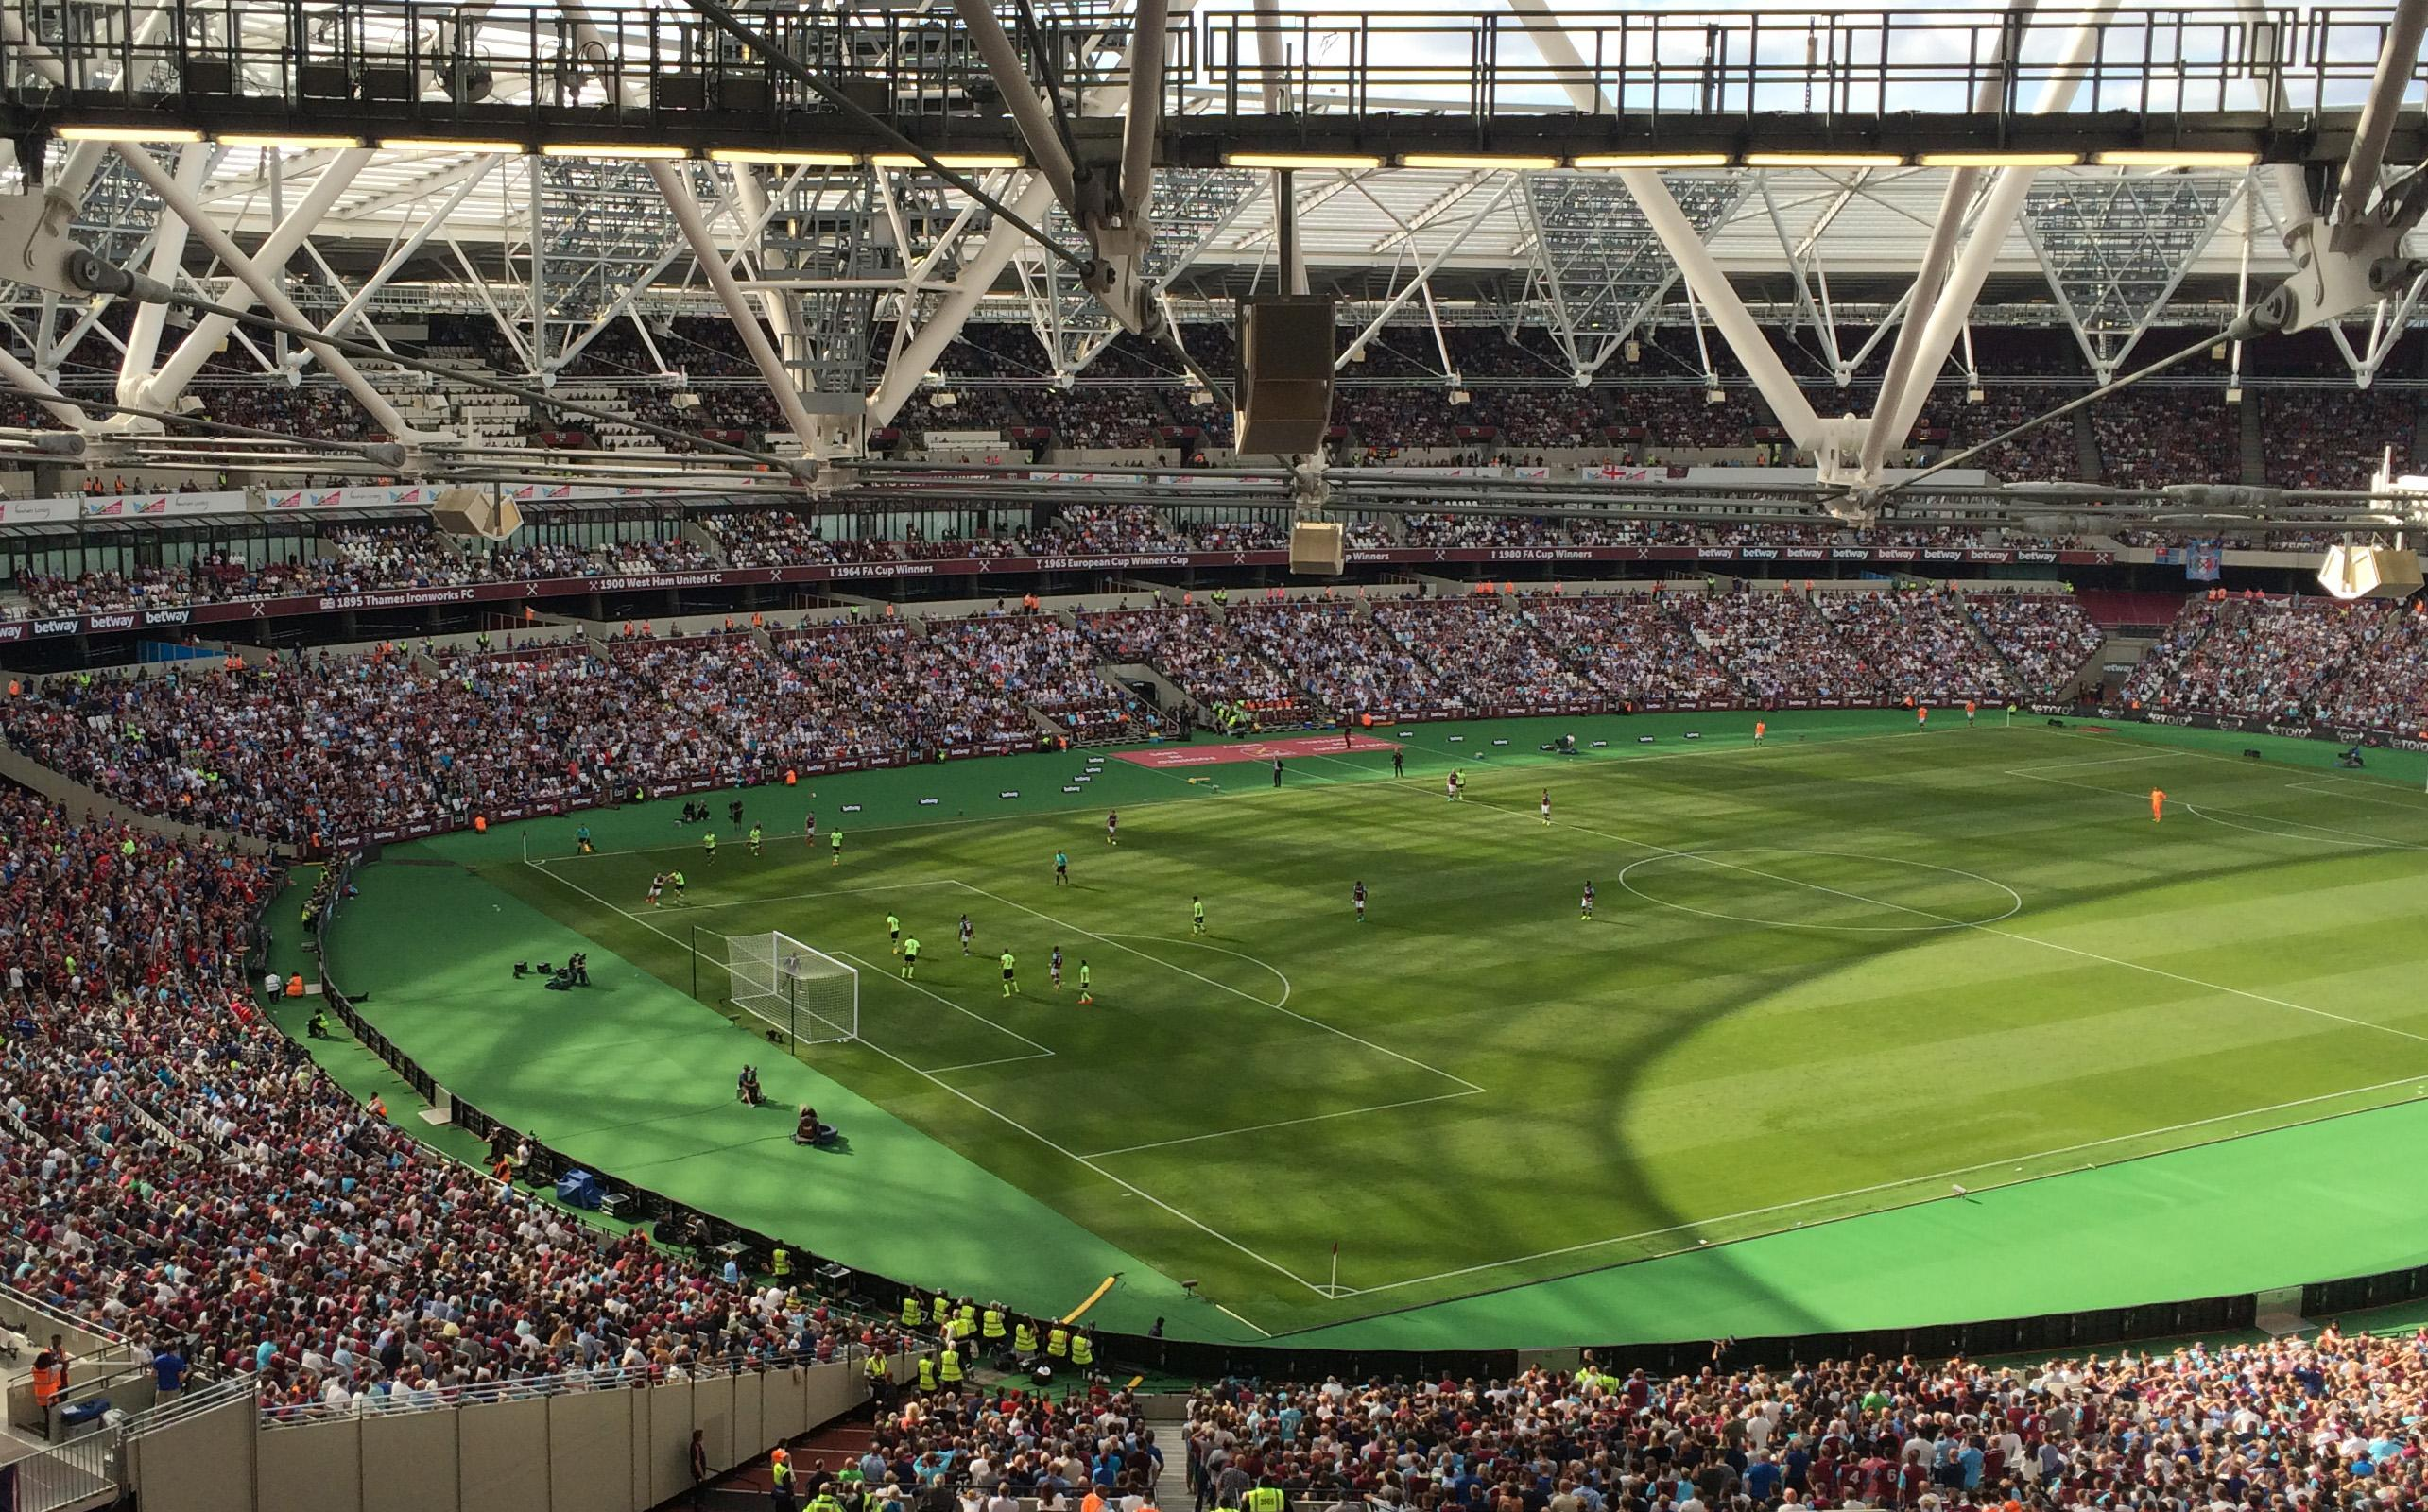 London Stadium Section 229 Row 63 Seat 664